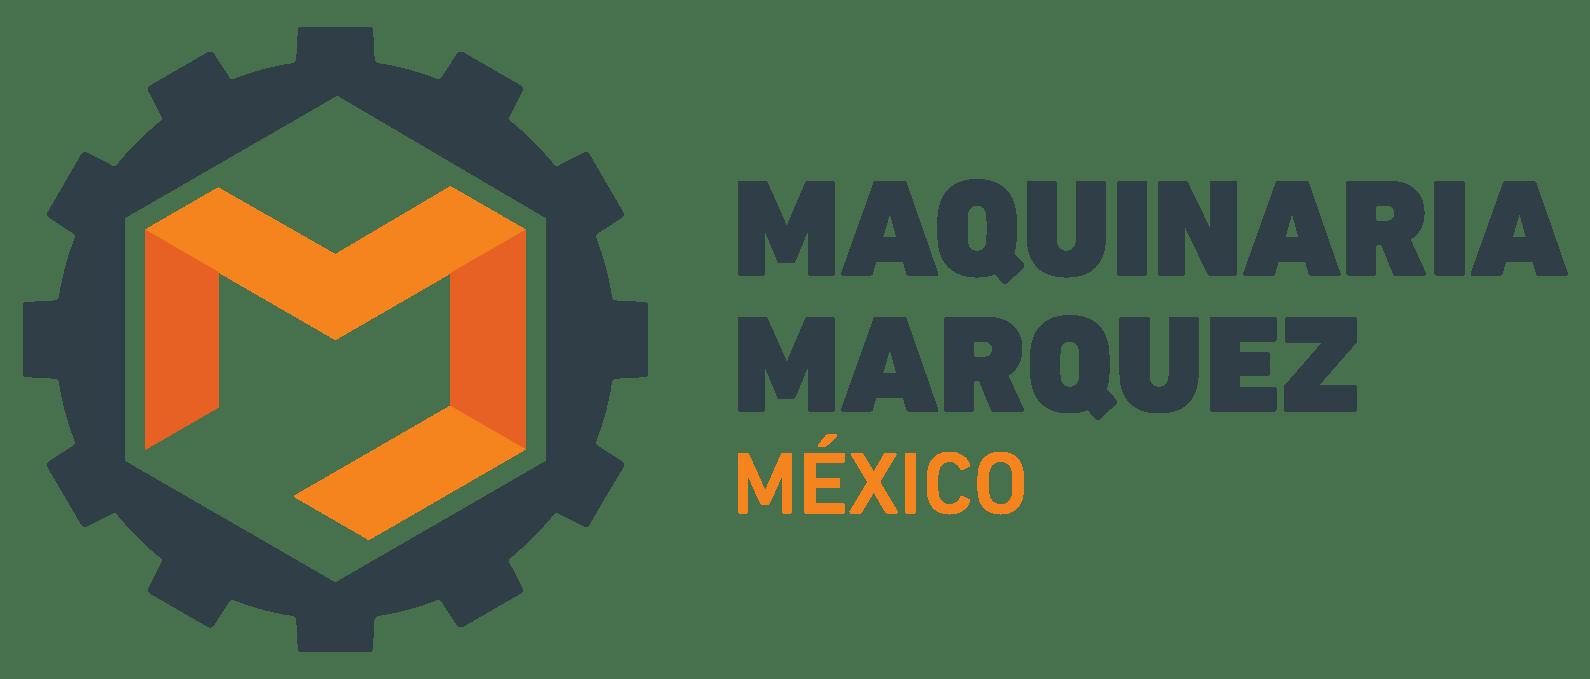 Maquinaria Marquez